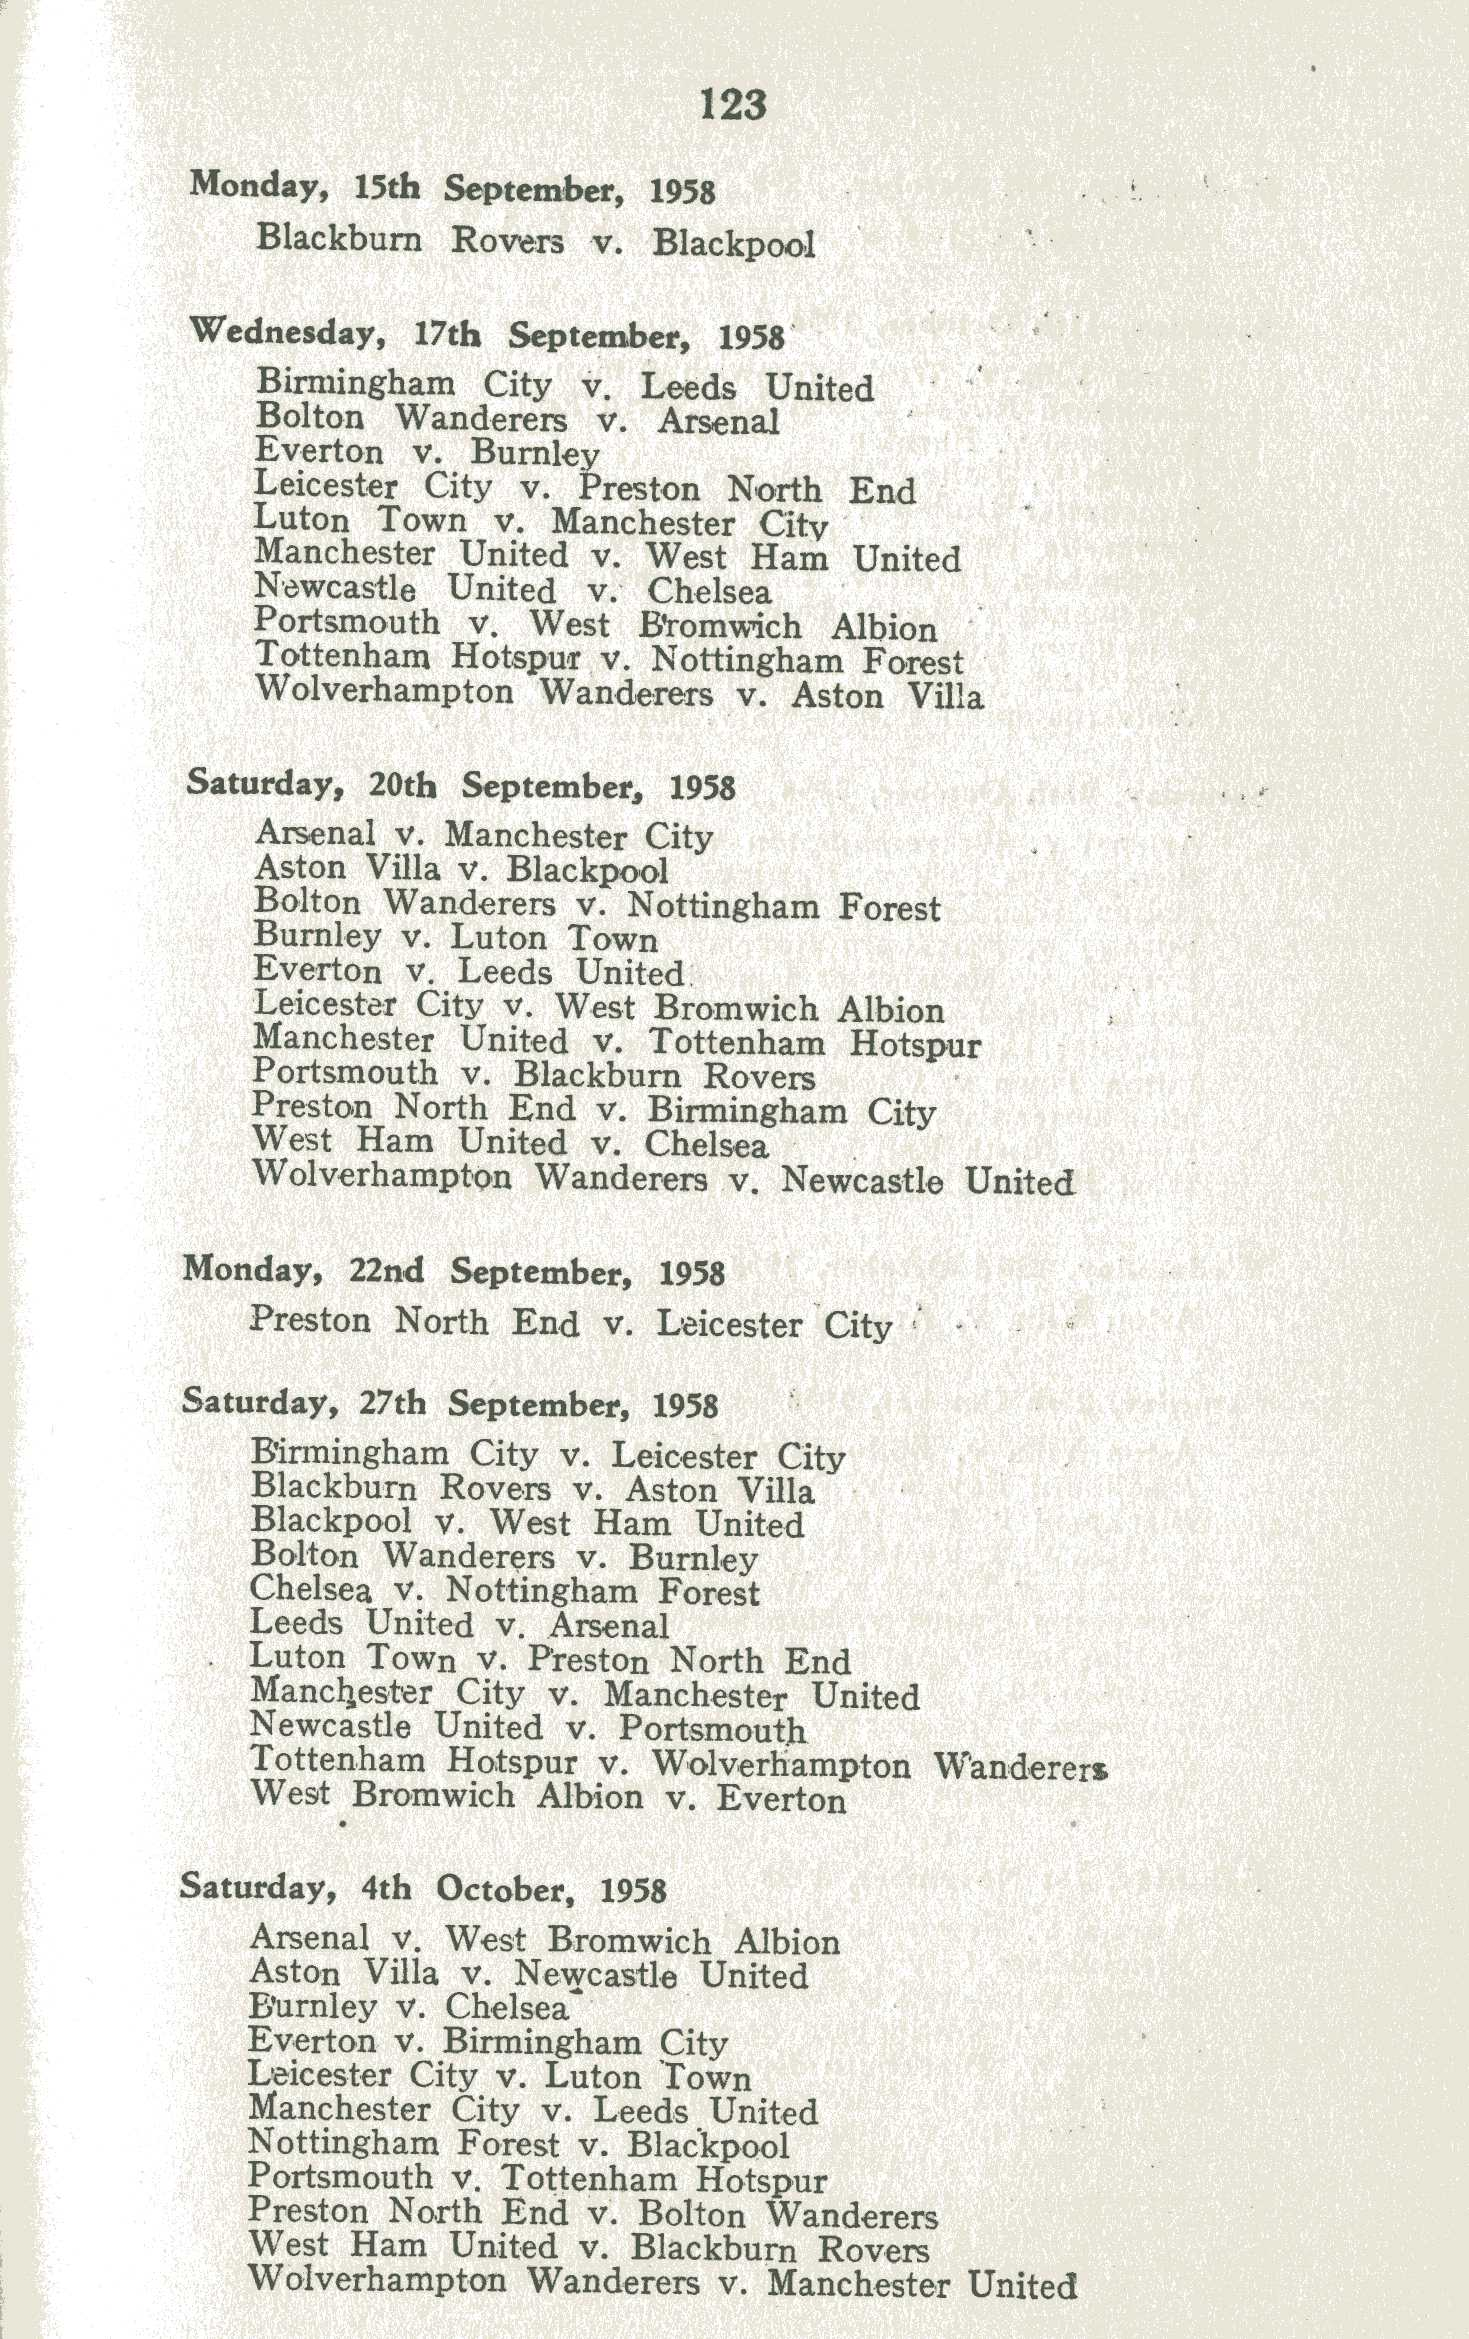 Football League Ltd v Littlewoods Pools Ltd [1959] 1 Ch 637